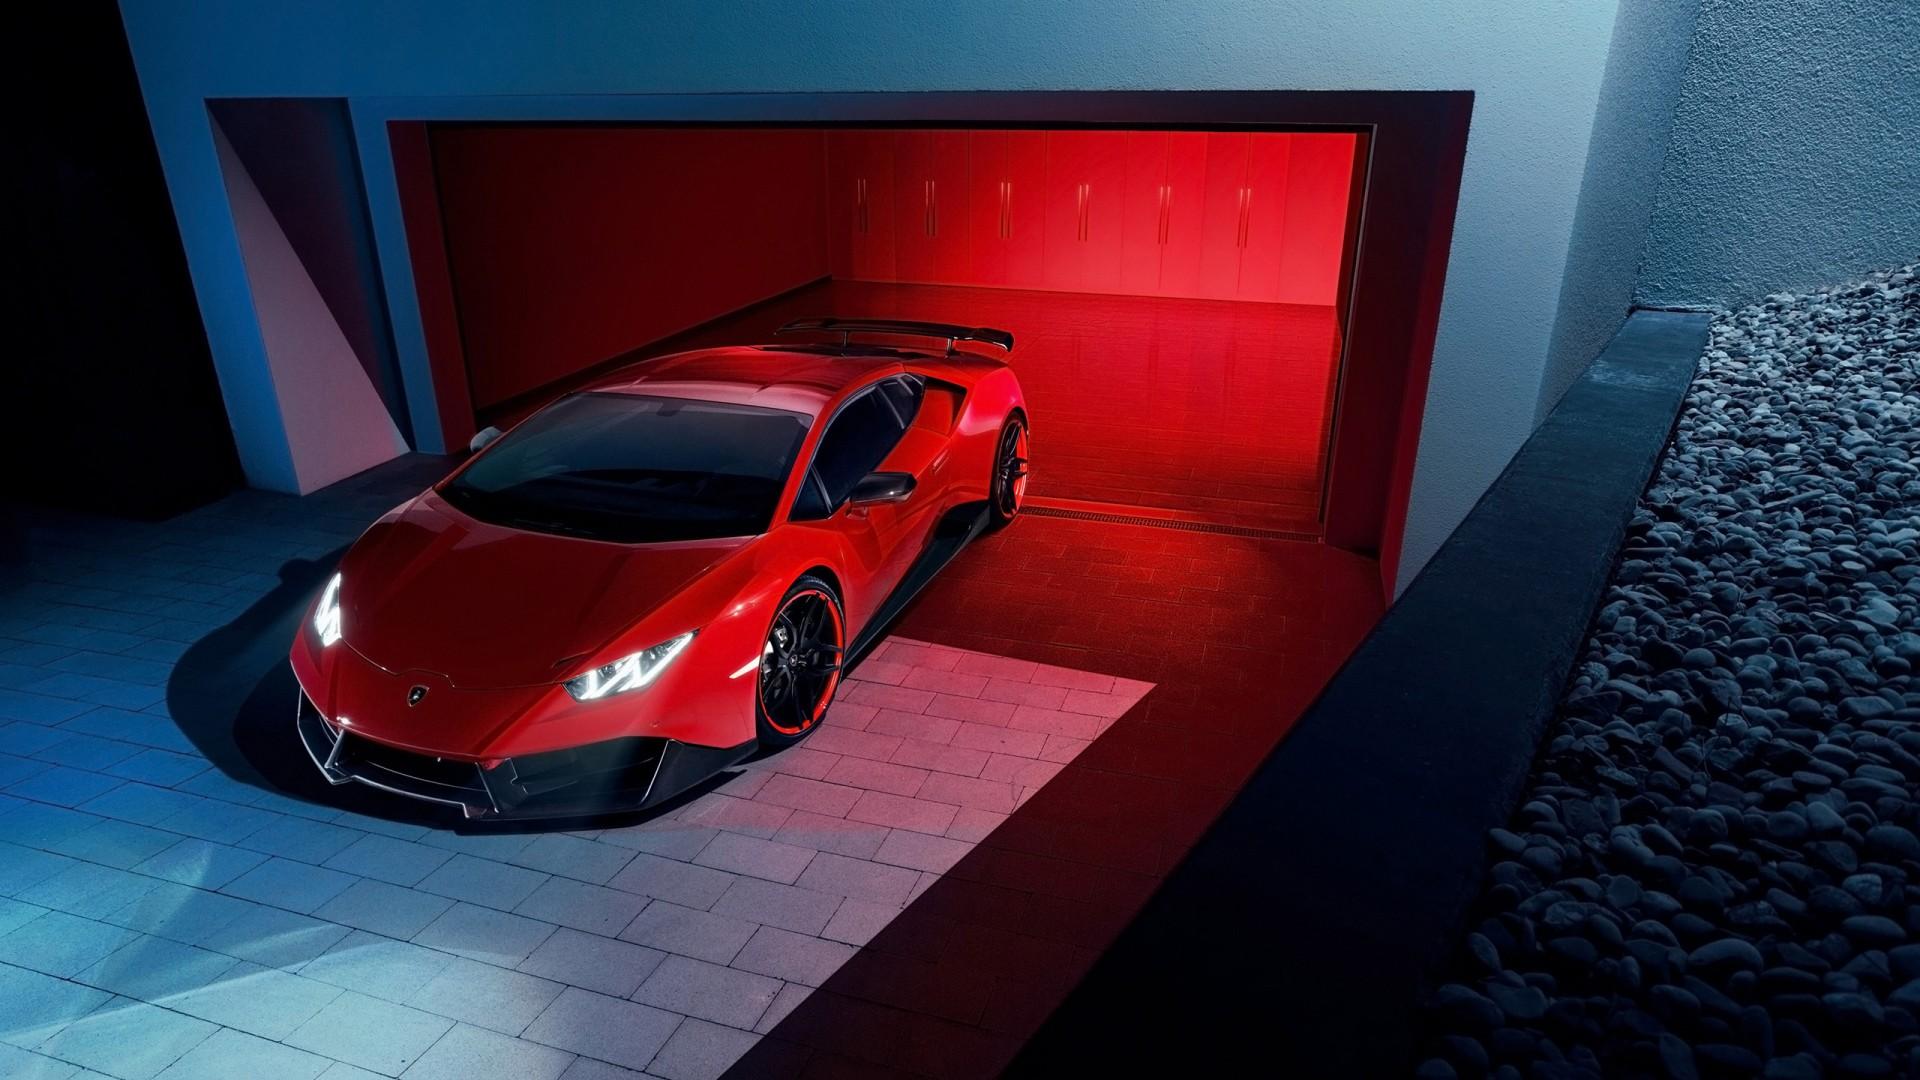 2016 Novitec Torado Lamborghini Huracan Rwd Coupe